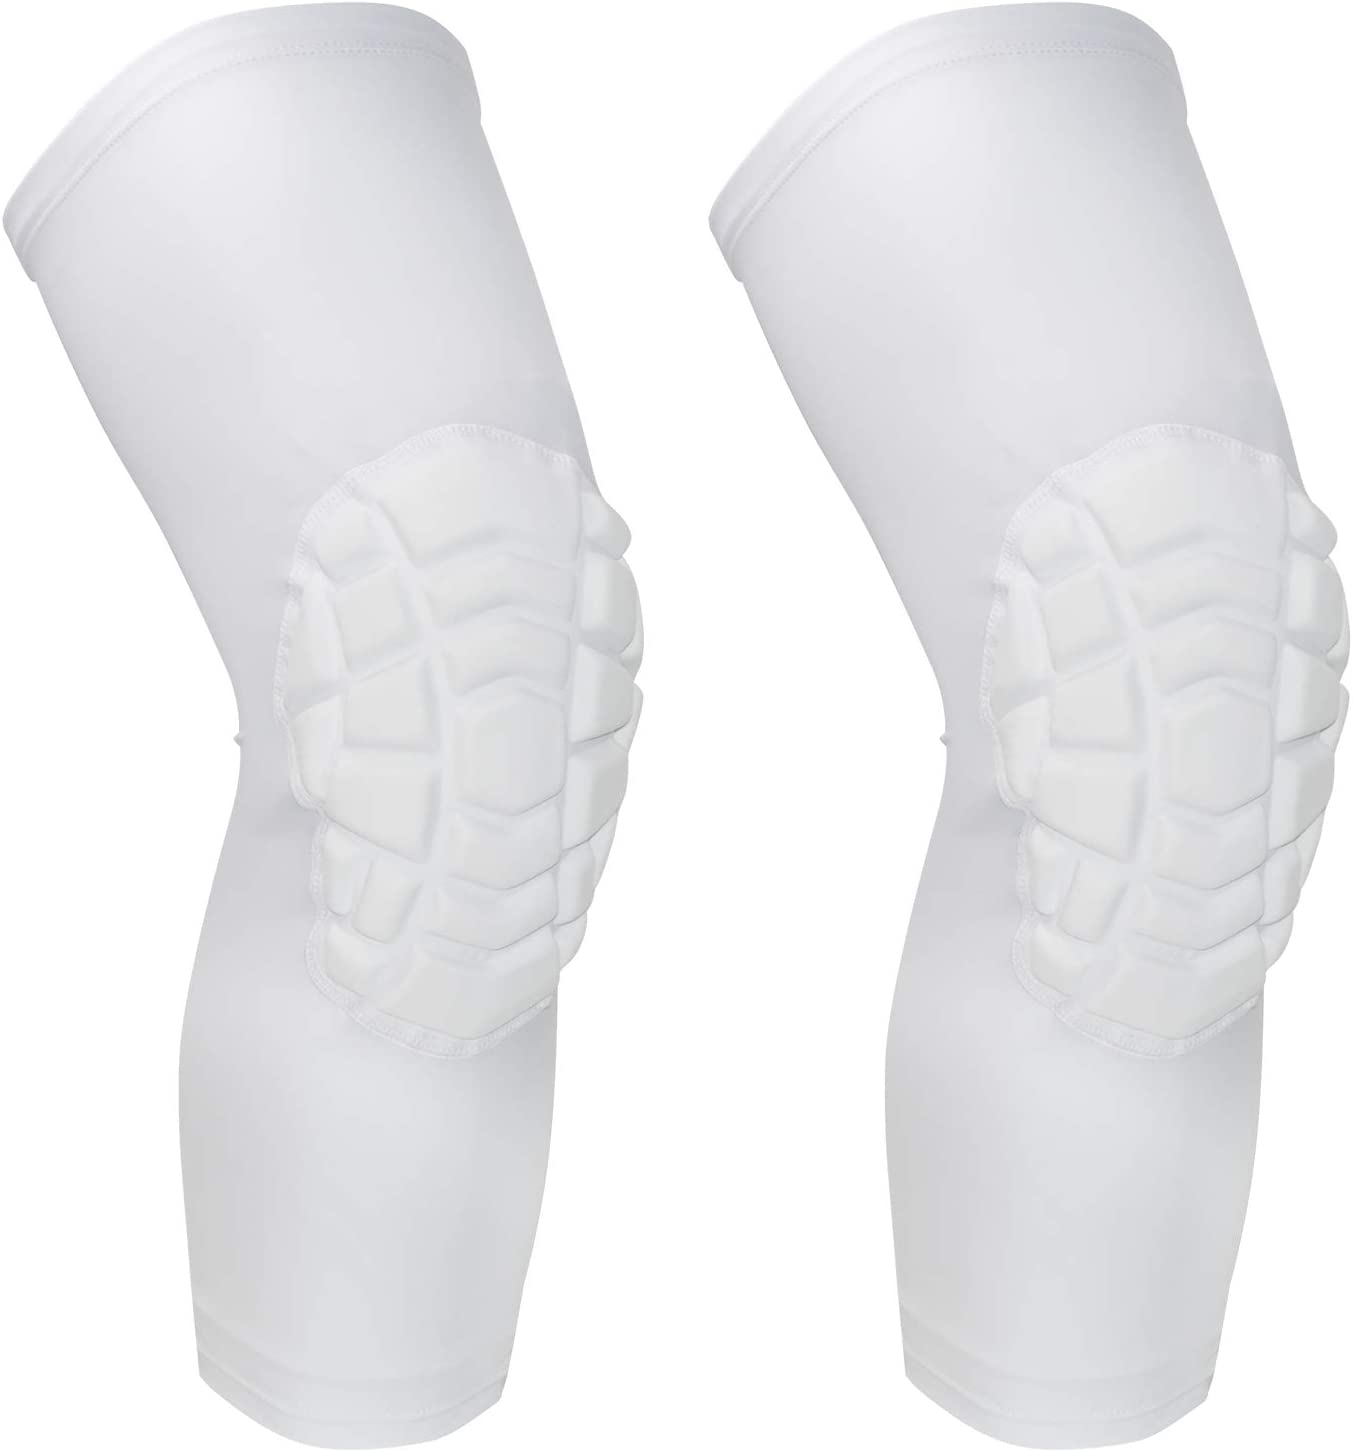 O-Best 2パック(1組)膝用保護パッド 通気性のある着圧ウェア ハニカム構造 衝撃に強い 滑り止め加工 バスケットボール用膝当て 脚用プロテクターギア 白い-B Small